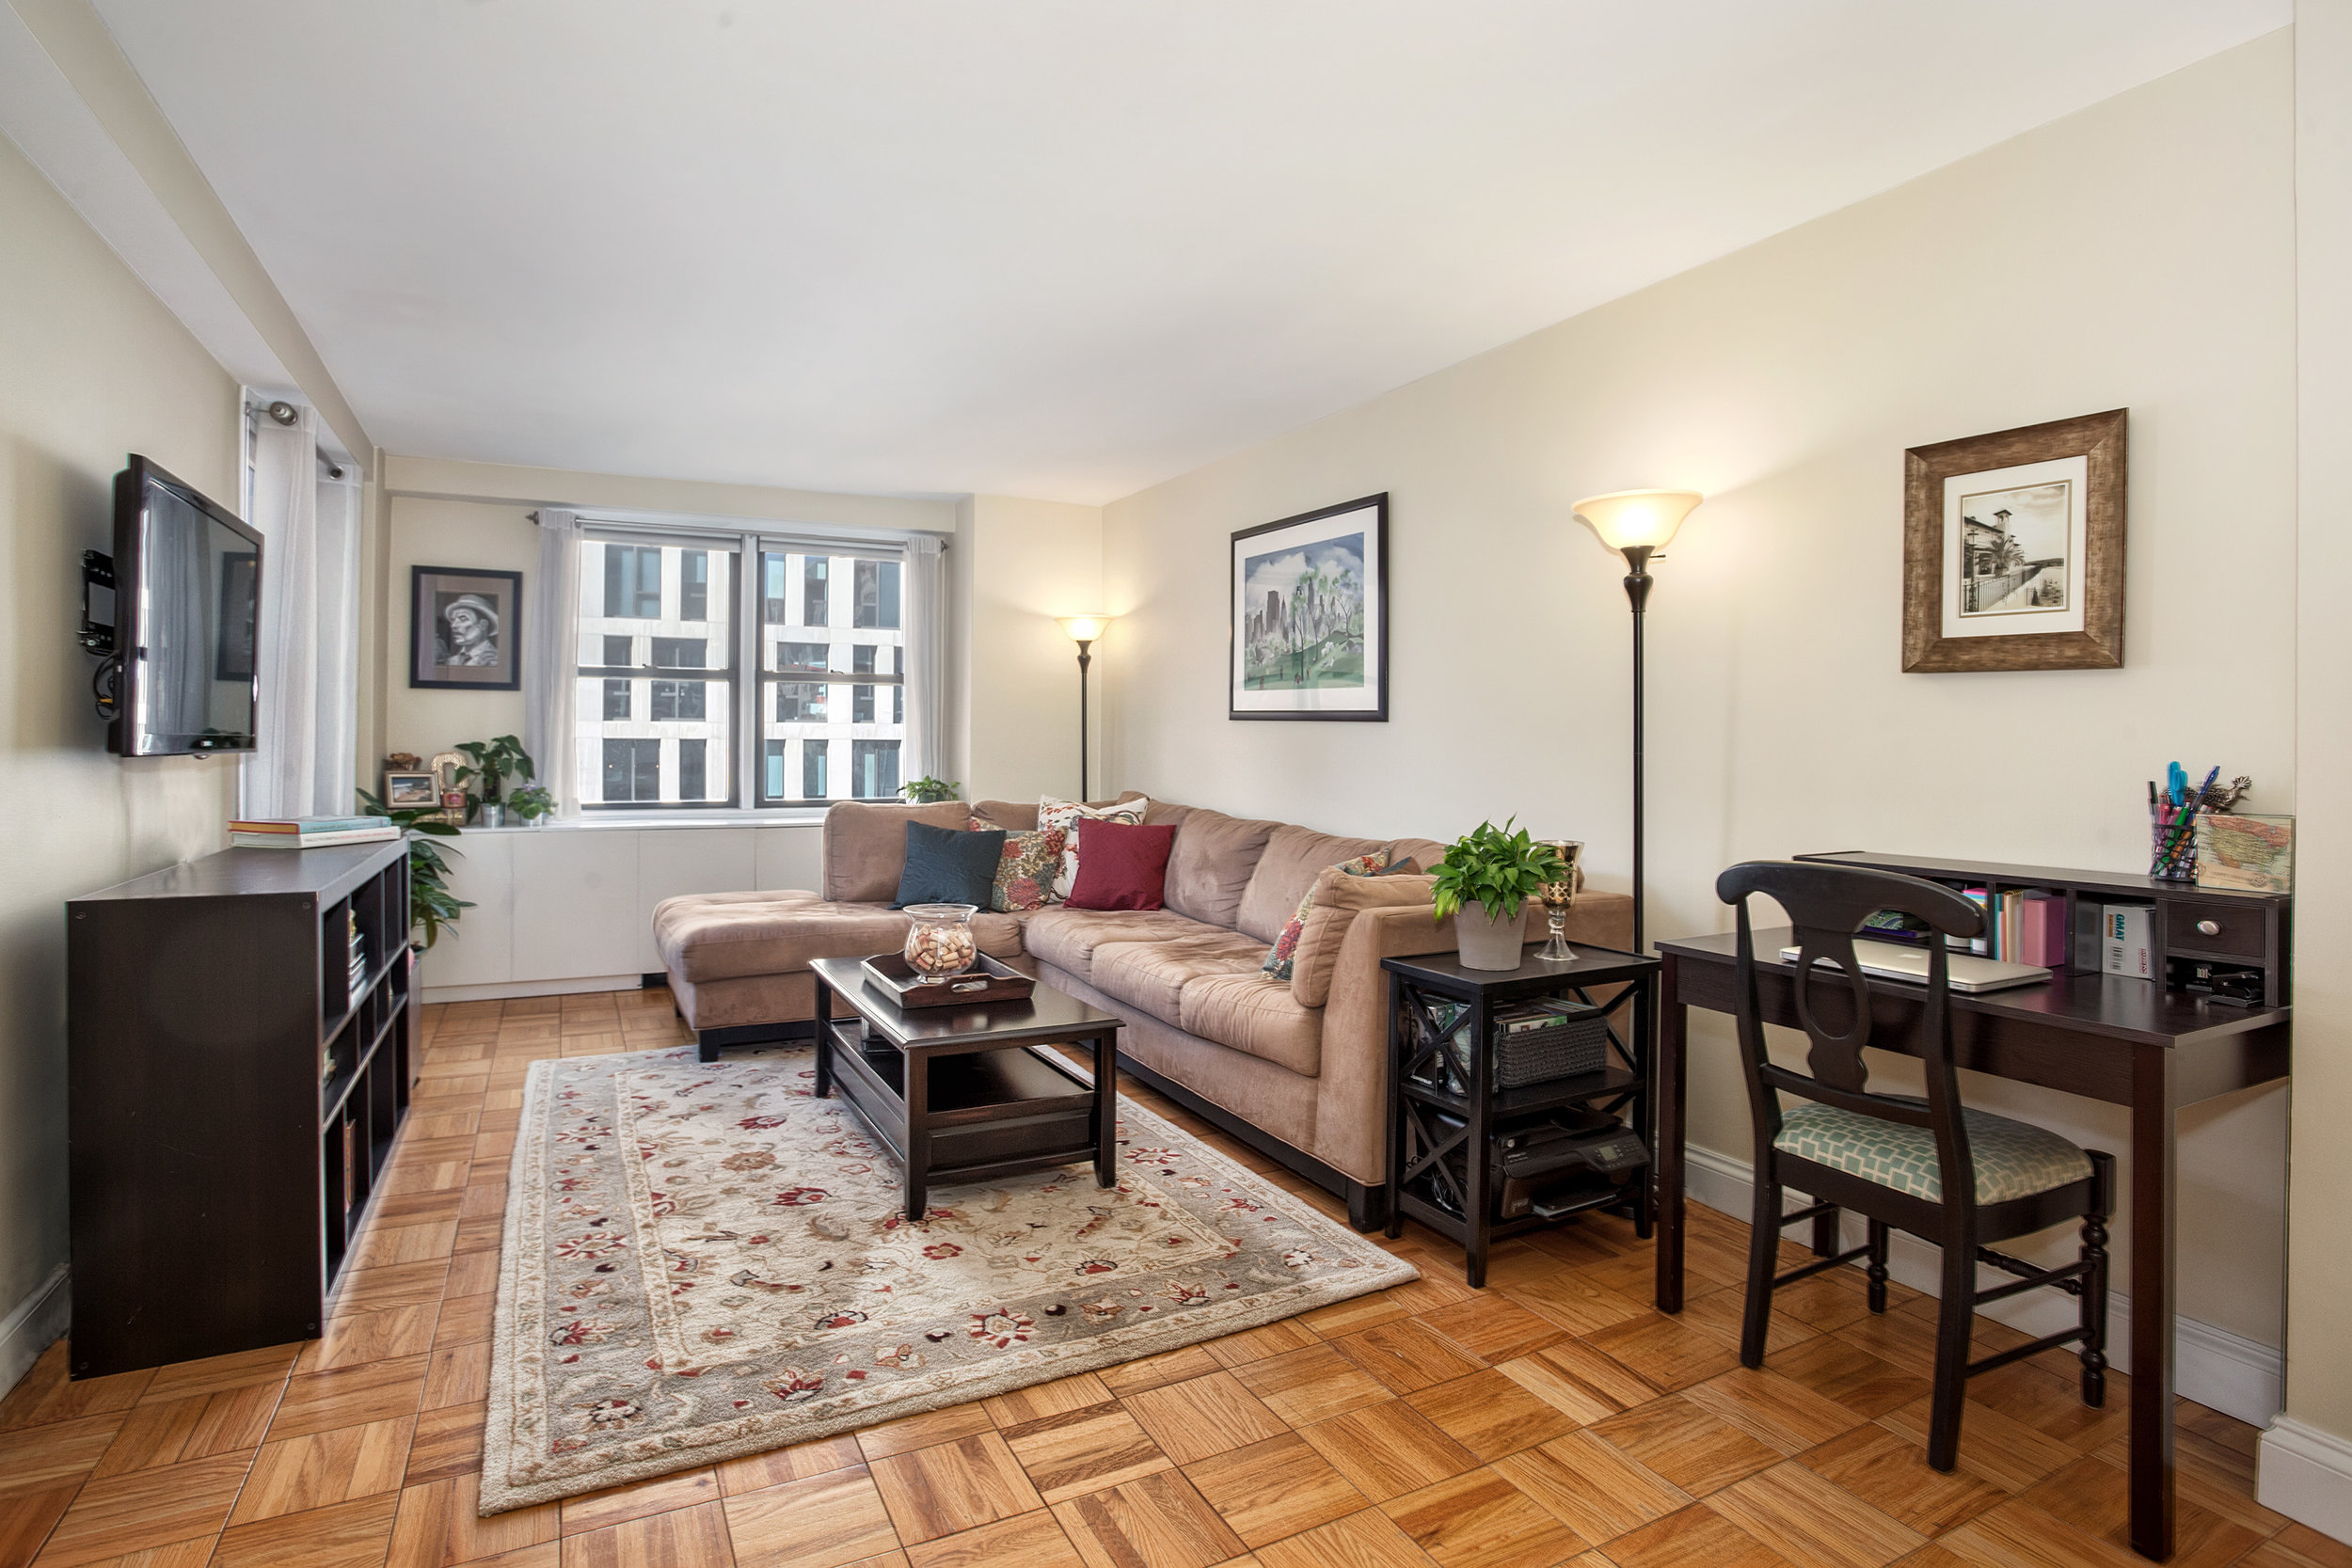 201 East 21st Street #7D - $835,000